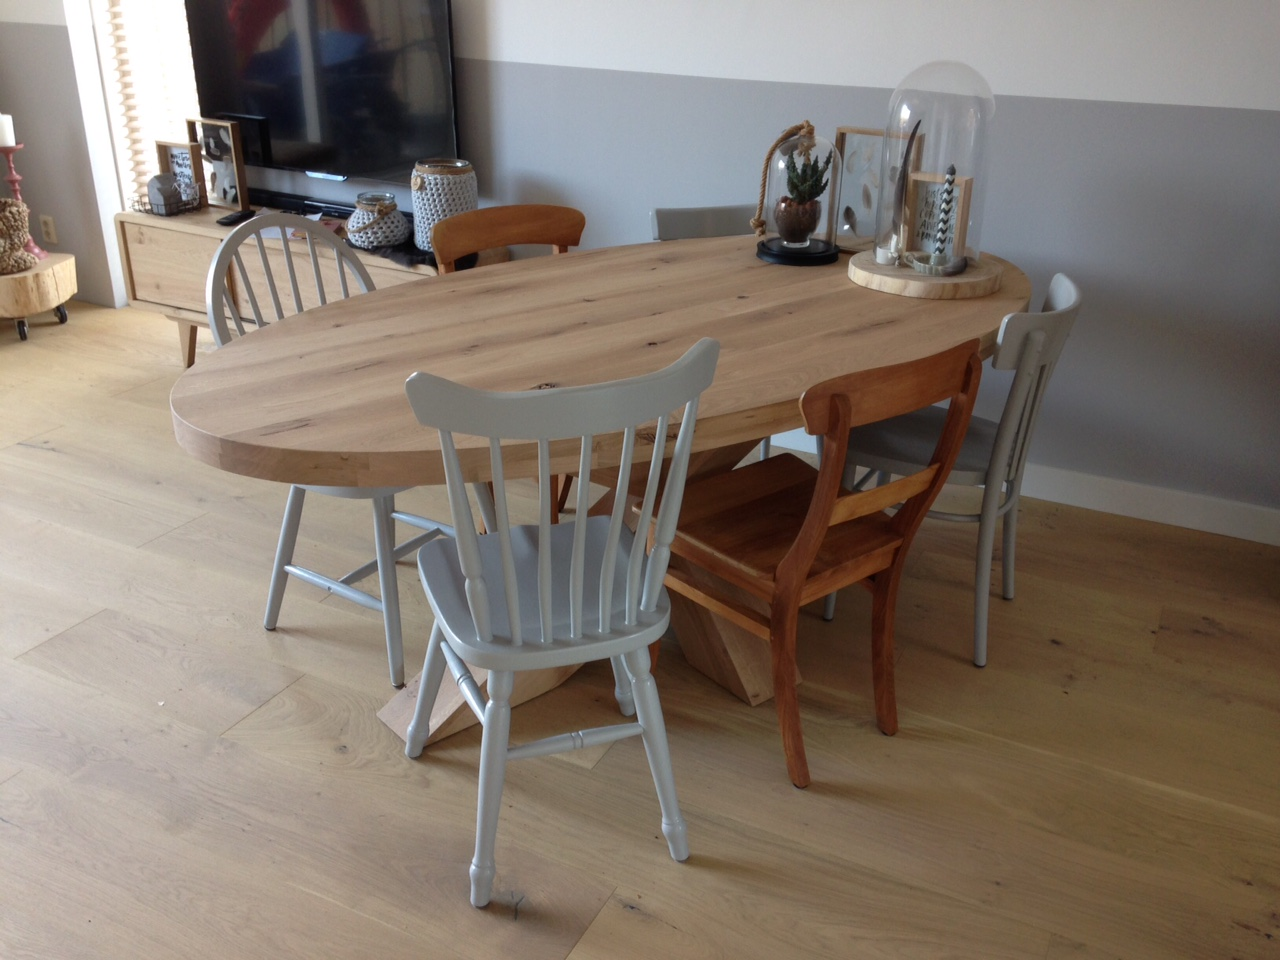 Ovale tafel eikenhout kruisonderstel   Te Boveldt Meubelmakerij  u0026 Interieurbouw